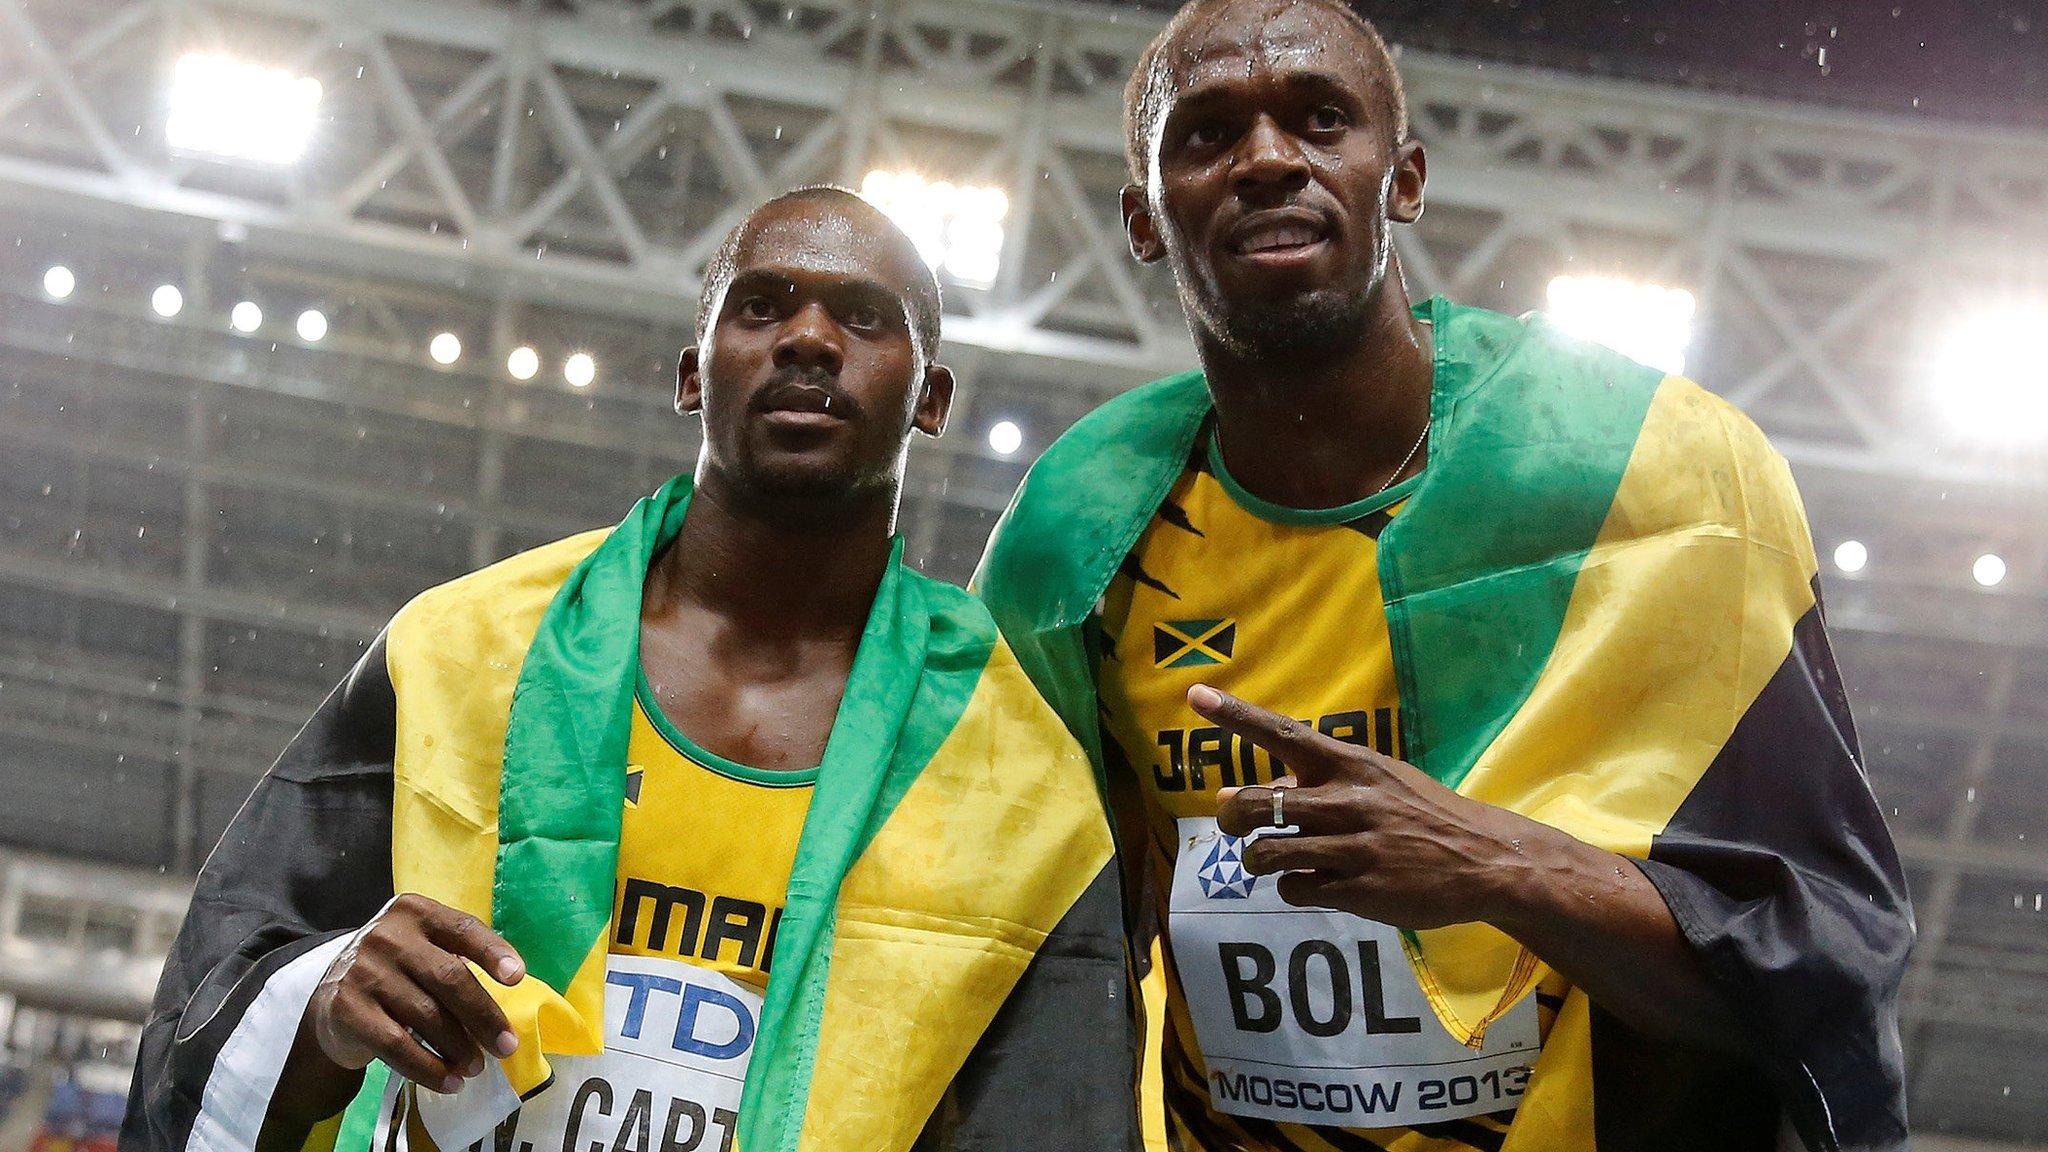 Usain Bolt Free Images